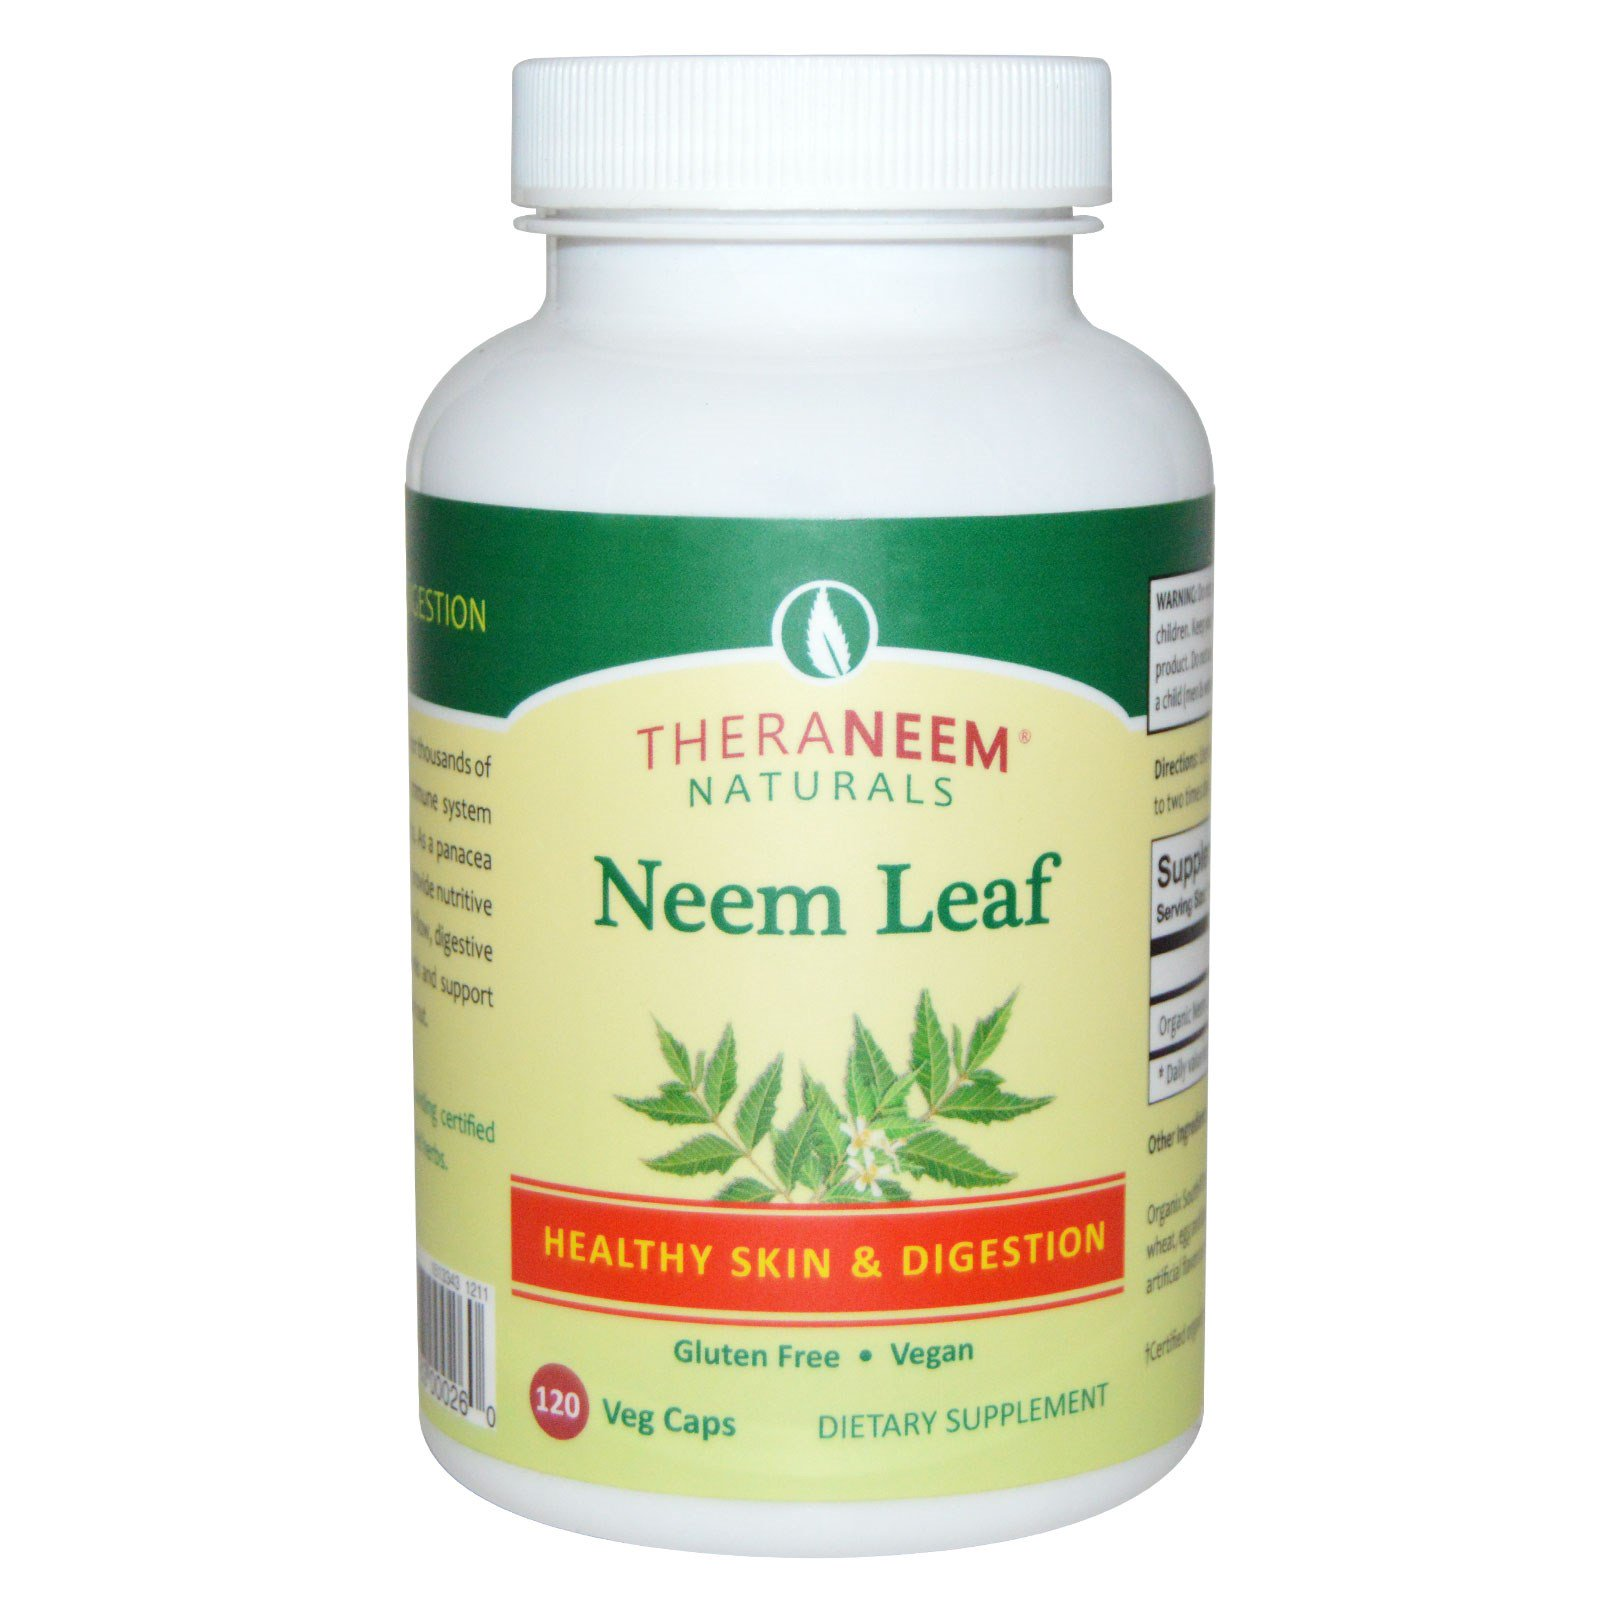 Organix South, TheraNeem Organix, Neem Leaf, 120 Veggie Caps